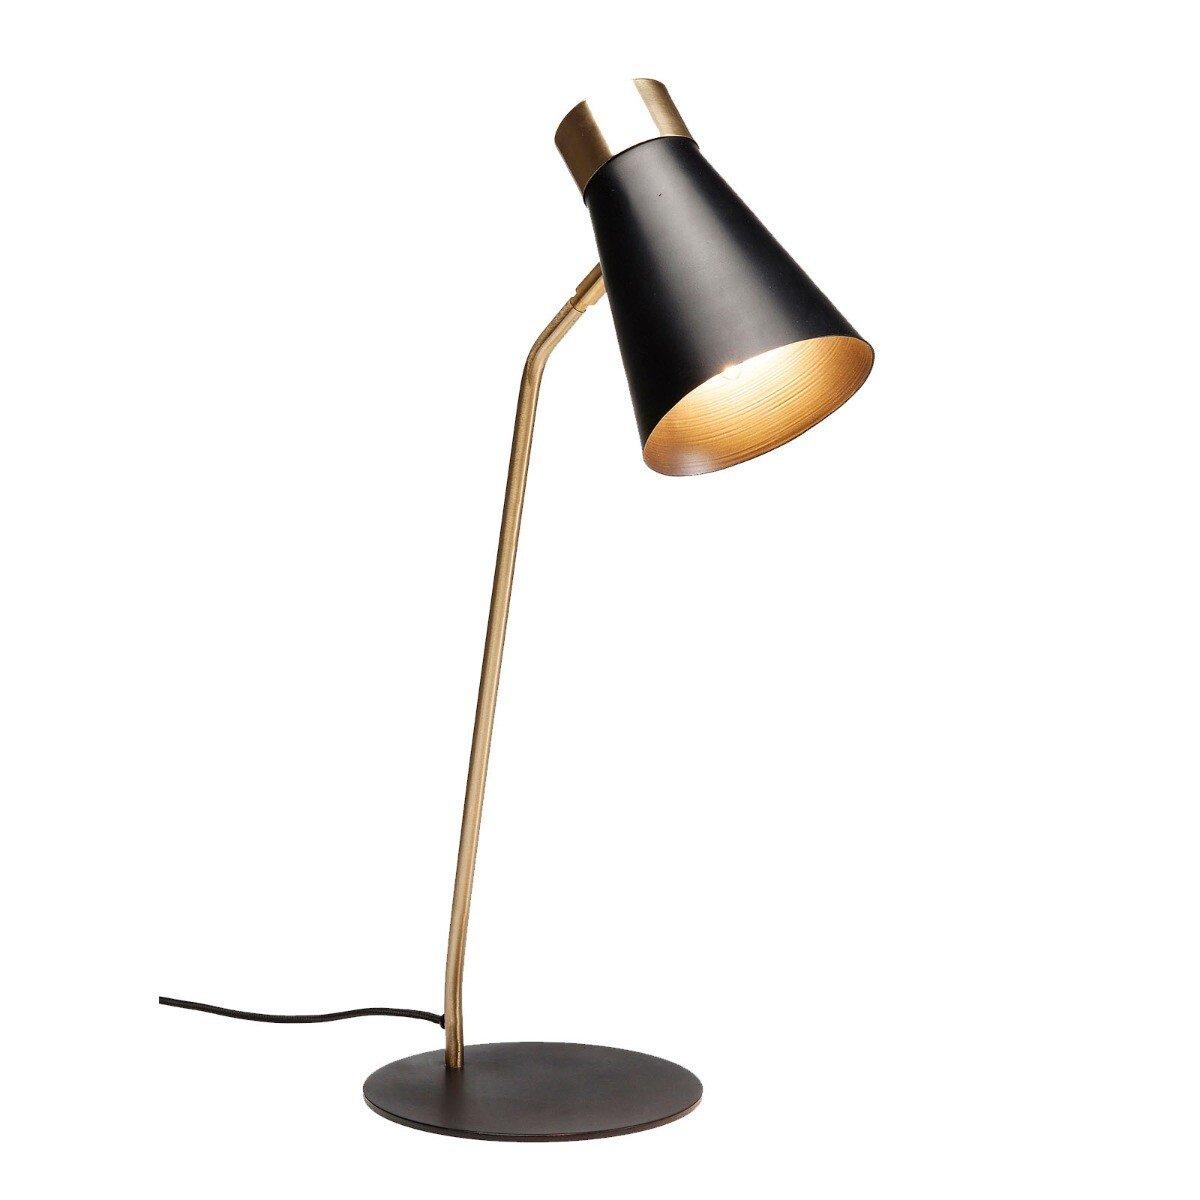 Kare Design tafellamp richmond black 64 x 22 x 38